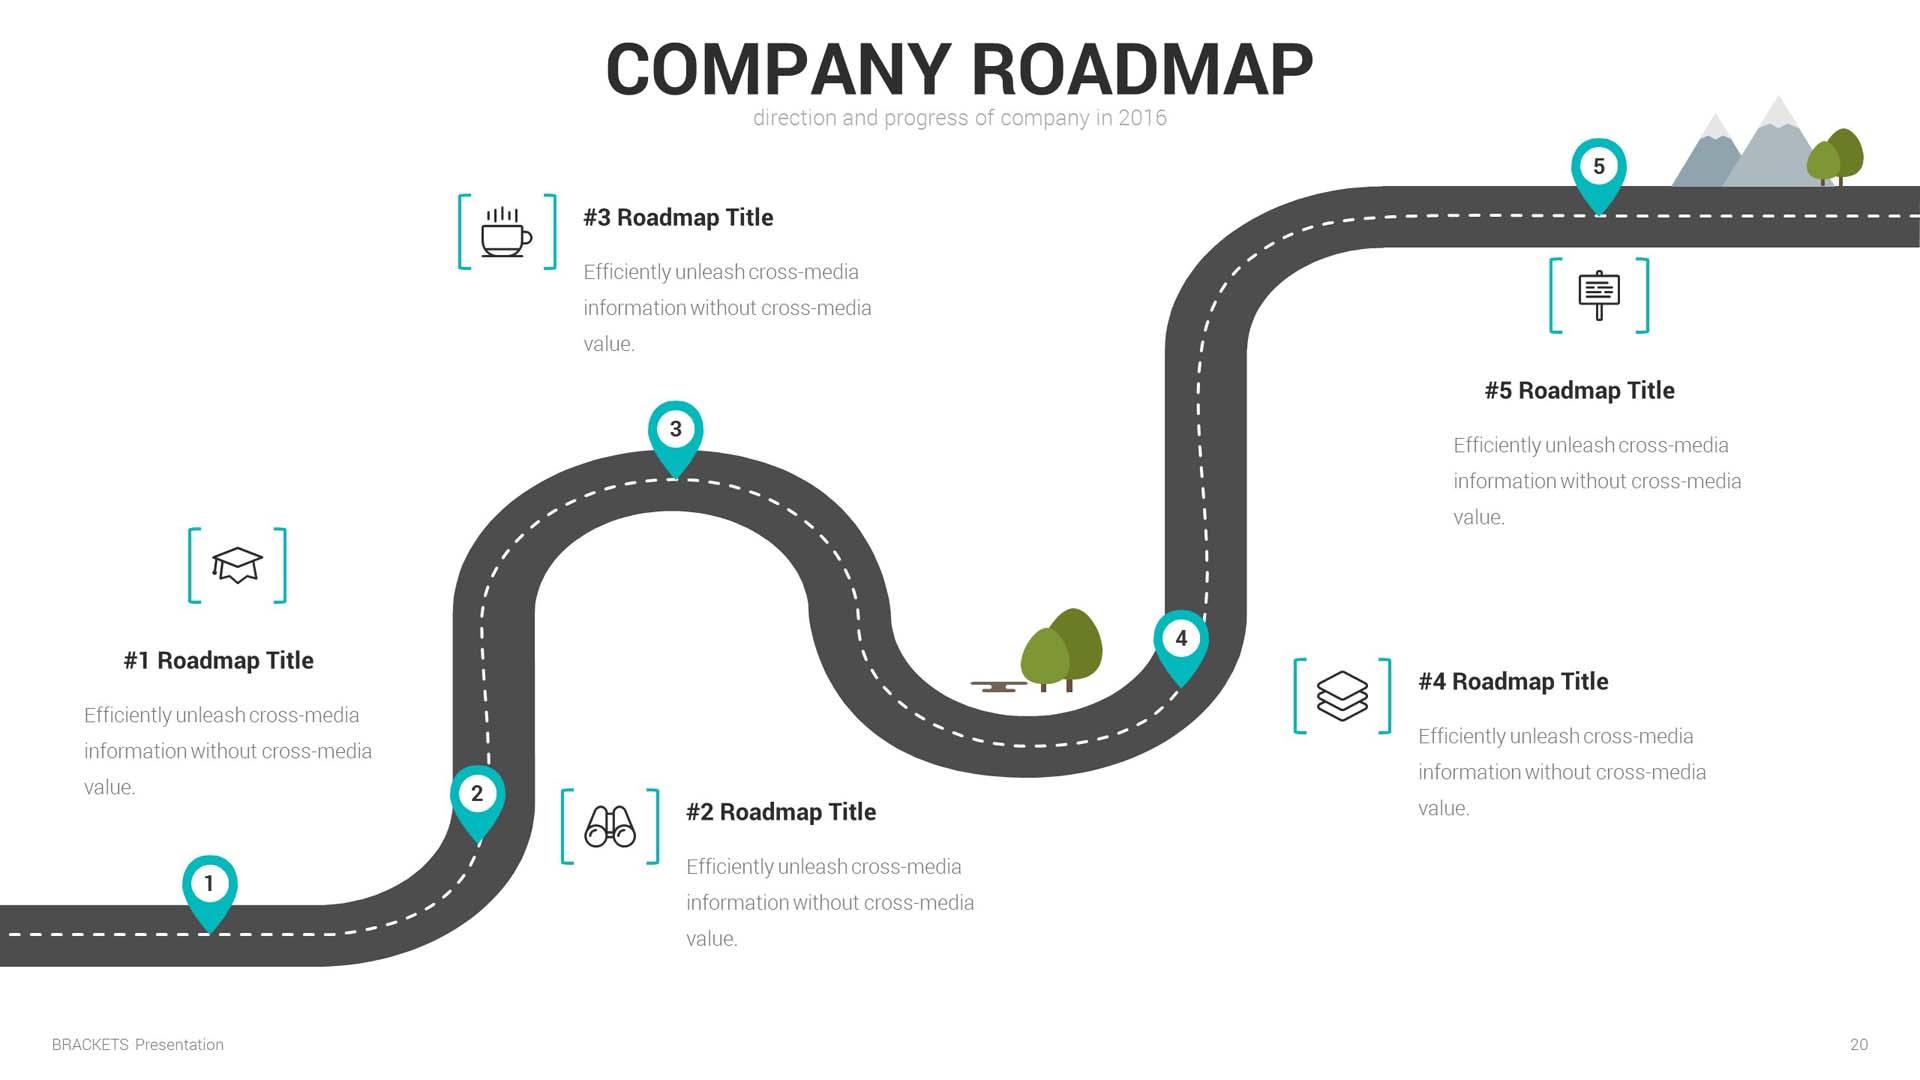 Brackets Multipurpose Keynote Template By Aumlette GraphicRiver - Keynote roadmap template